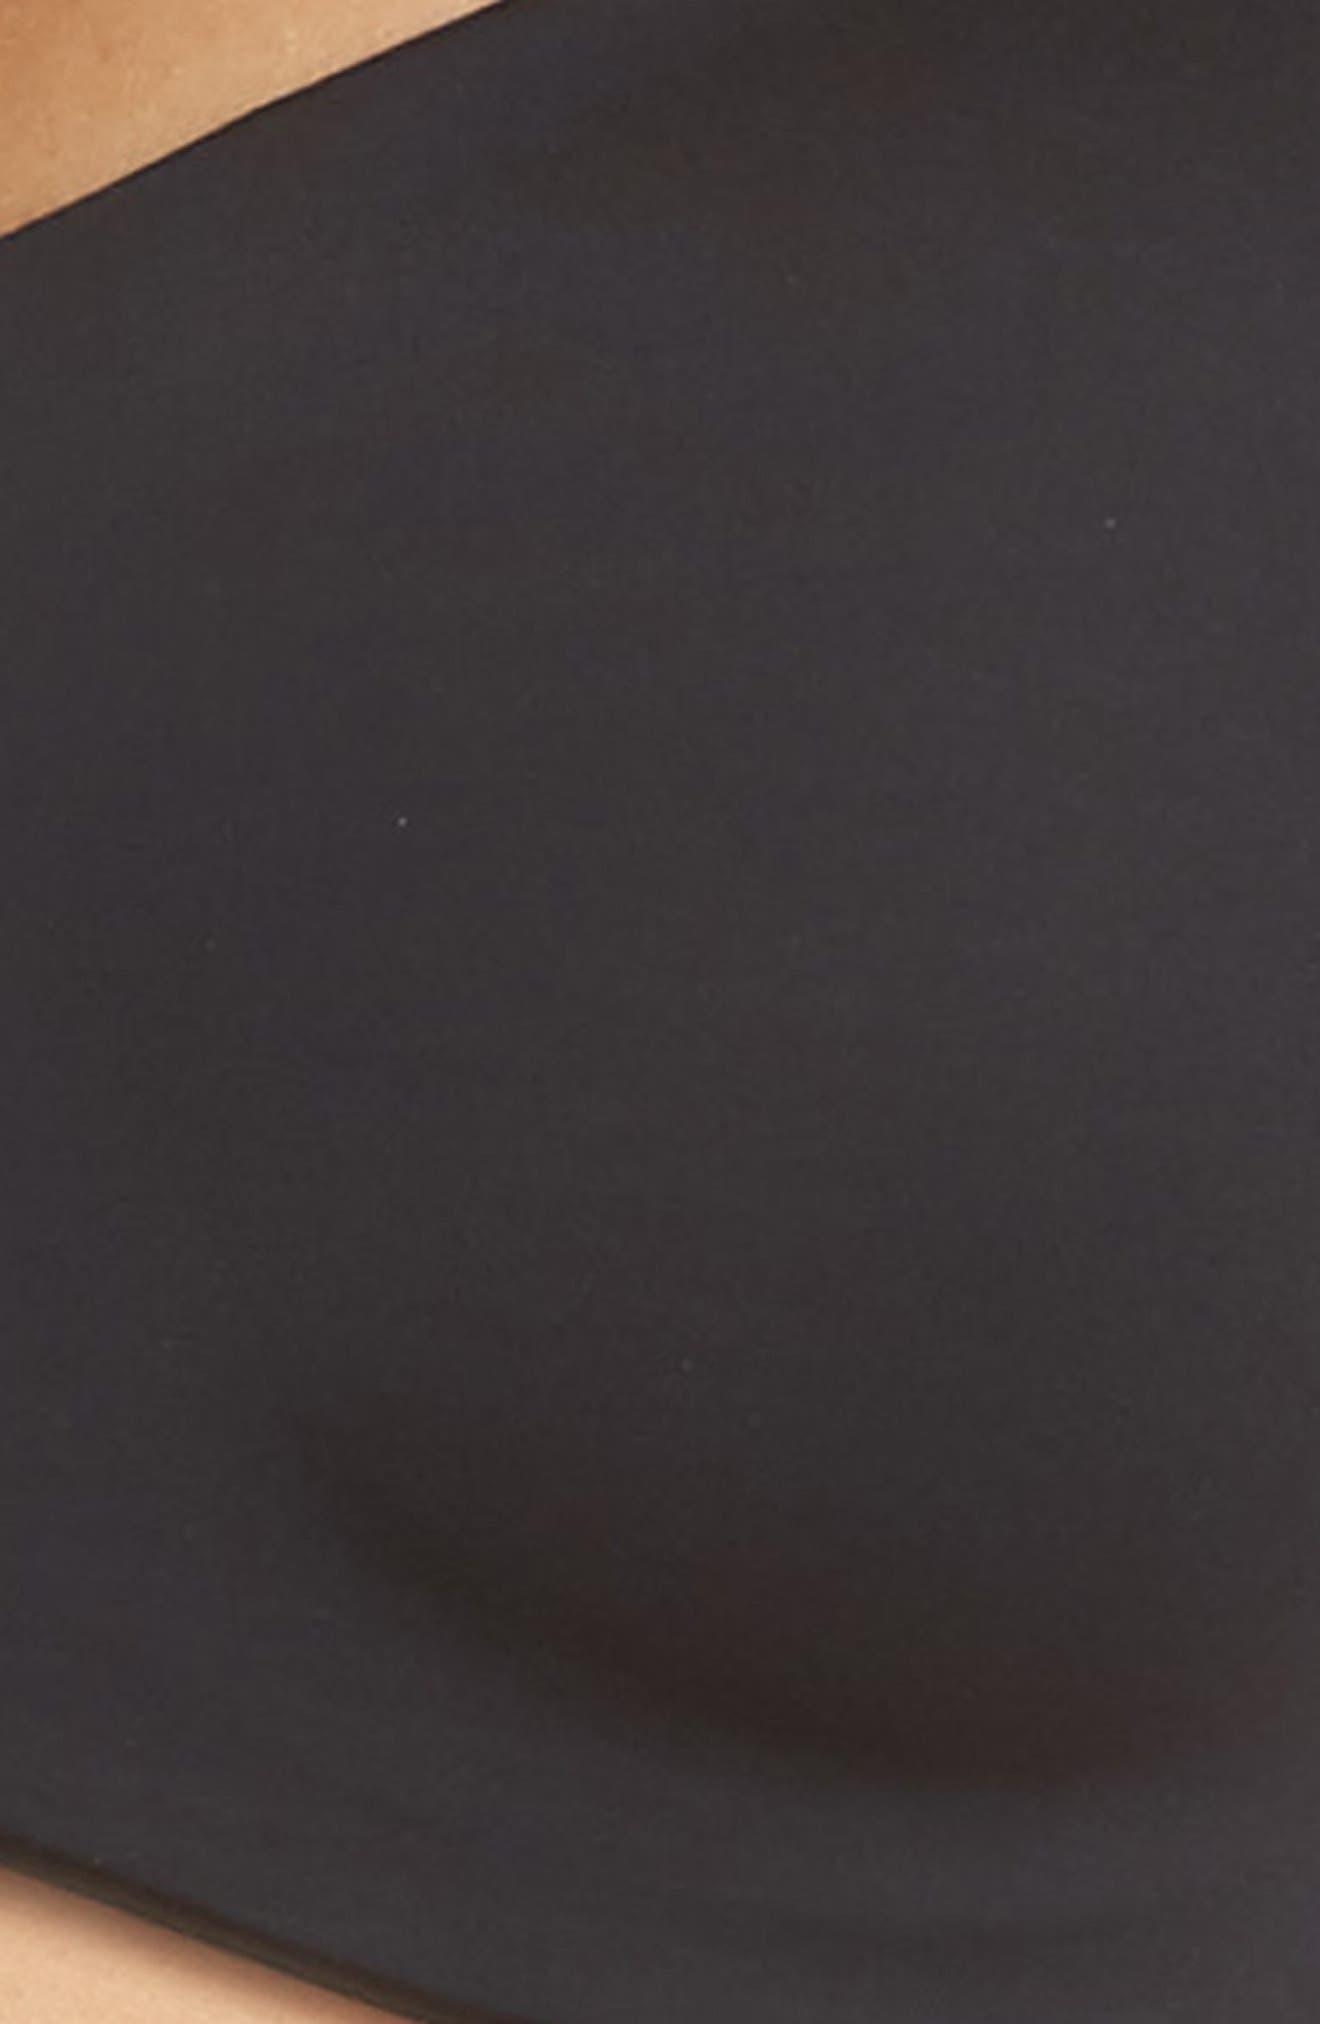 Underneath Underwire T-Shirt Bra,                             Alternate thumbnail 4, color,                             BLACK